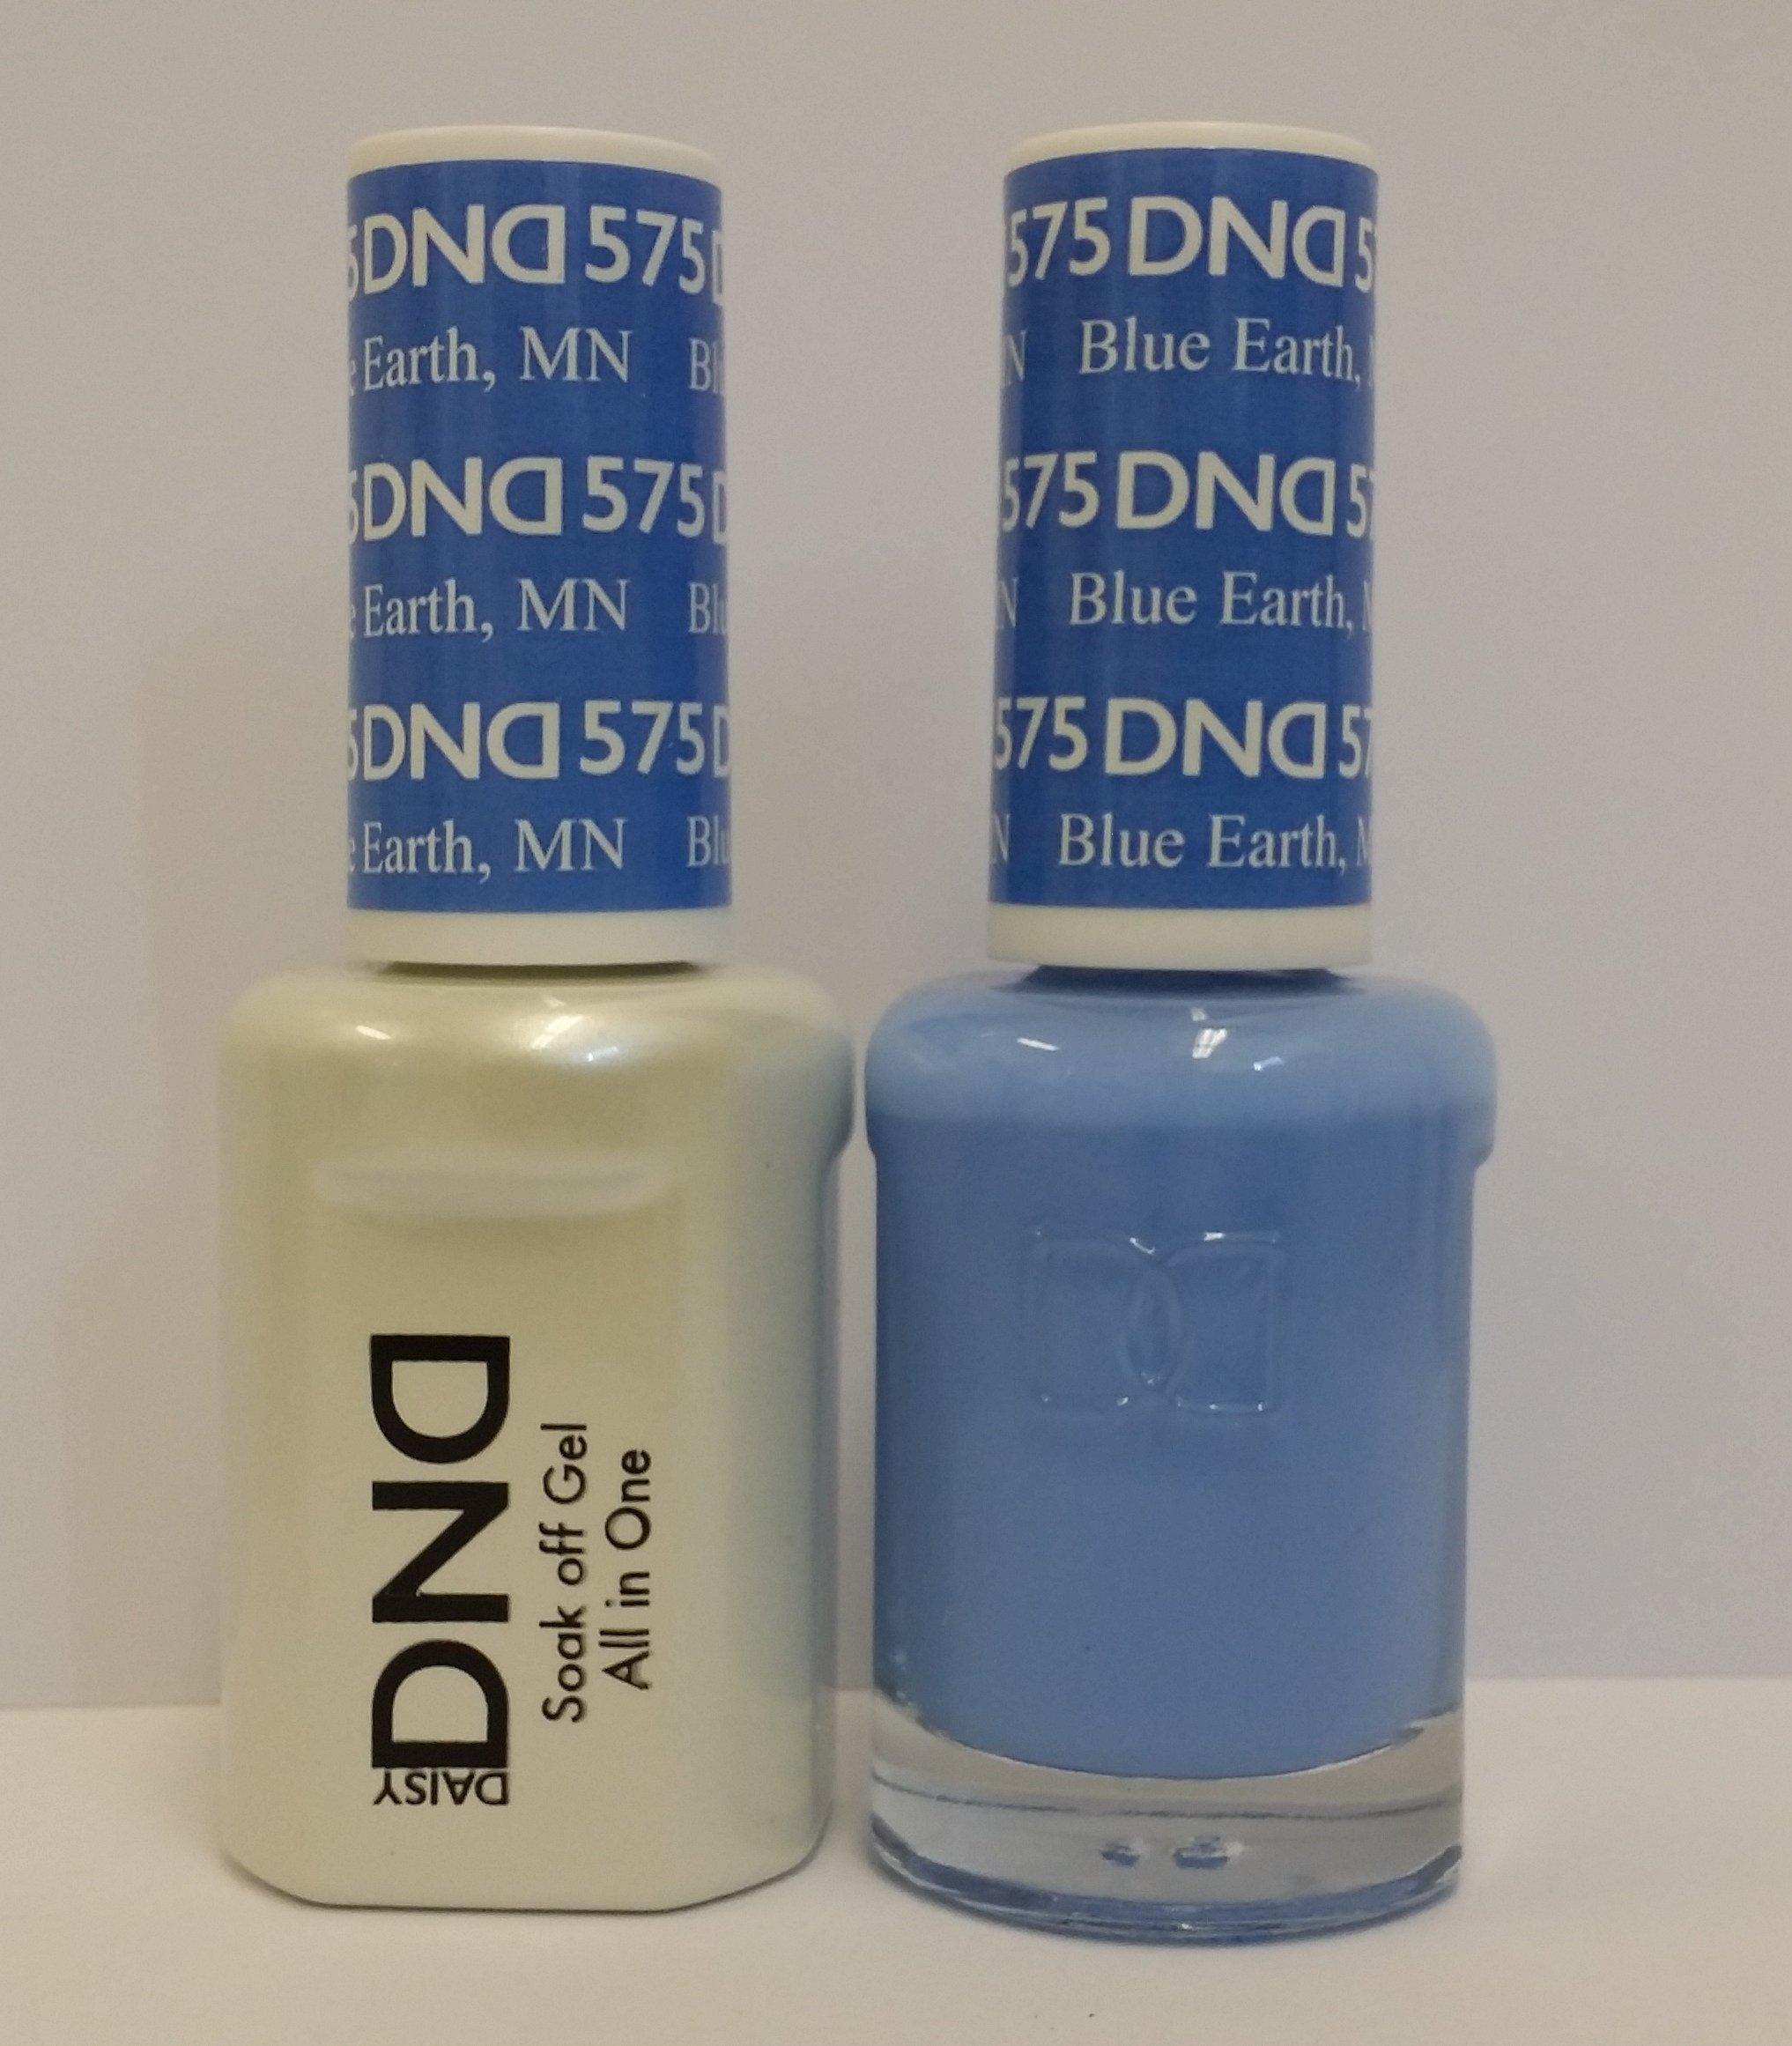 Amazon.com: DND DAISY DUO (GEL POLISH & MATCHING NAIL